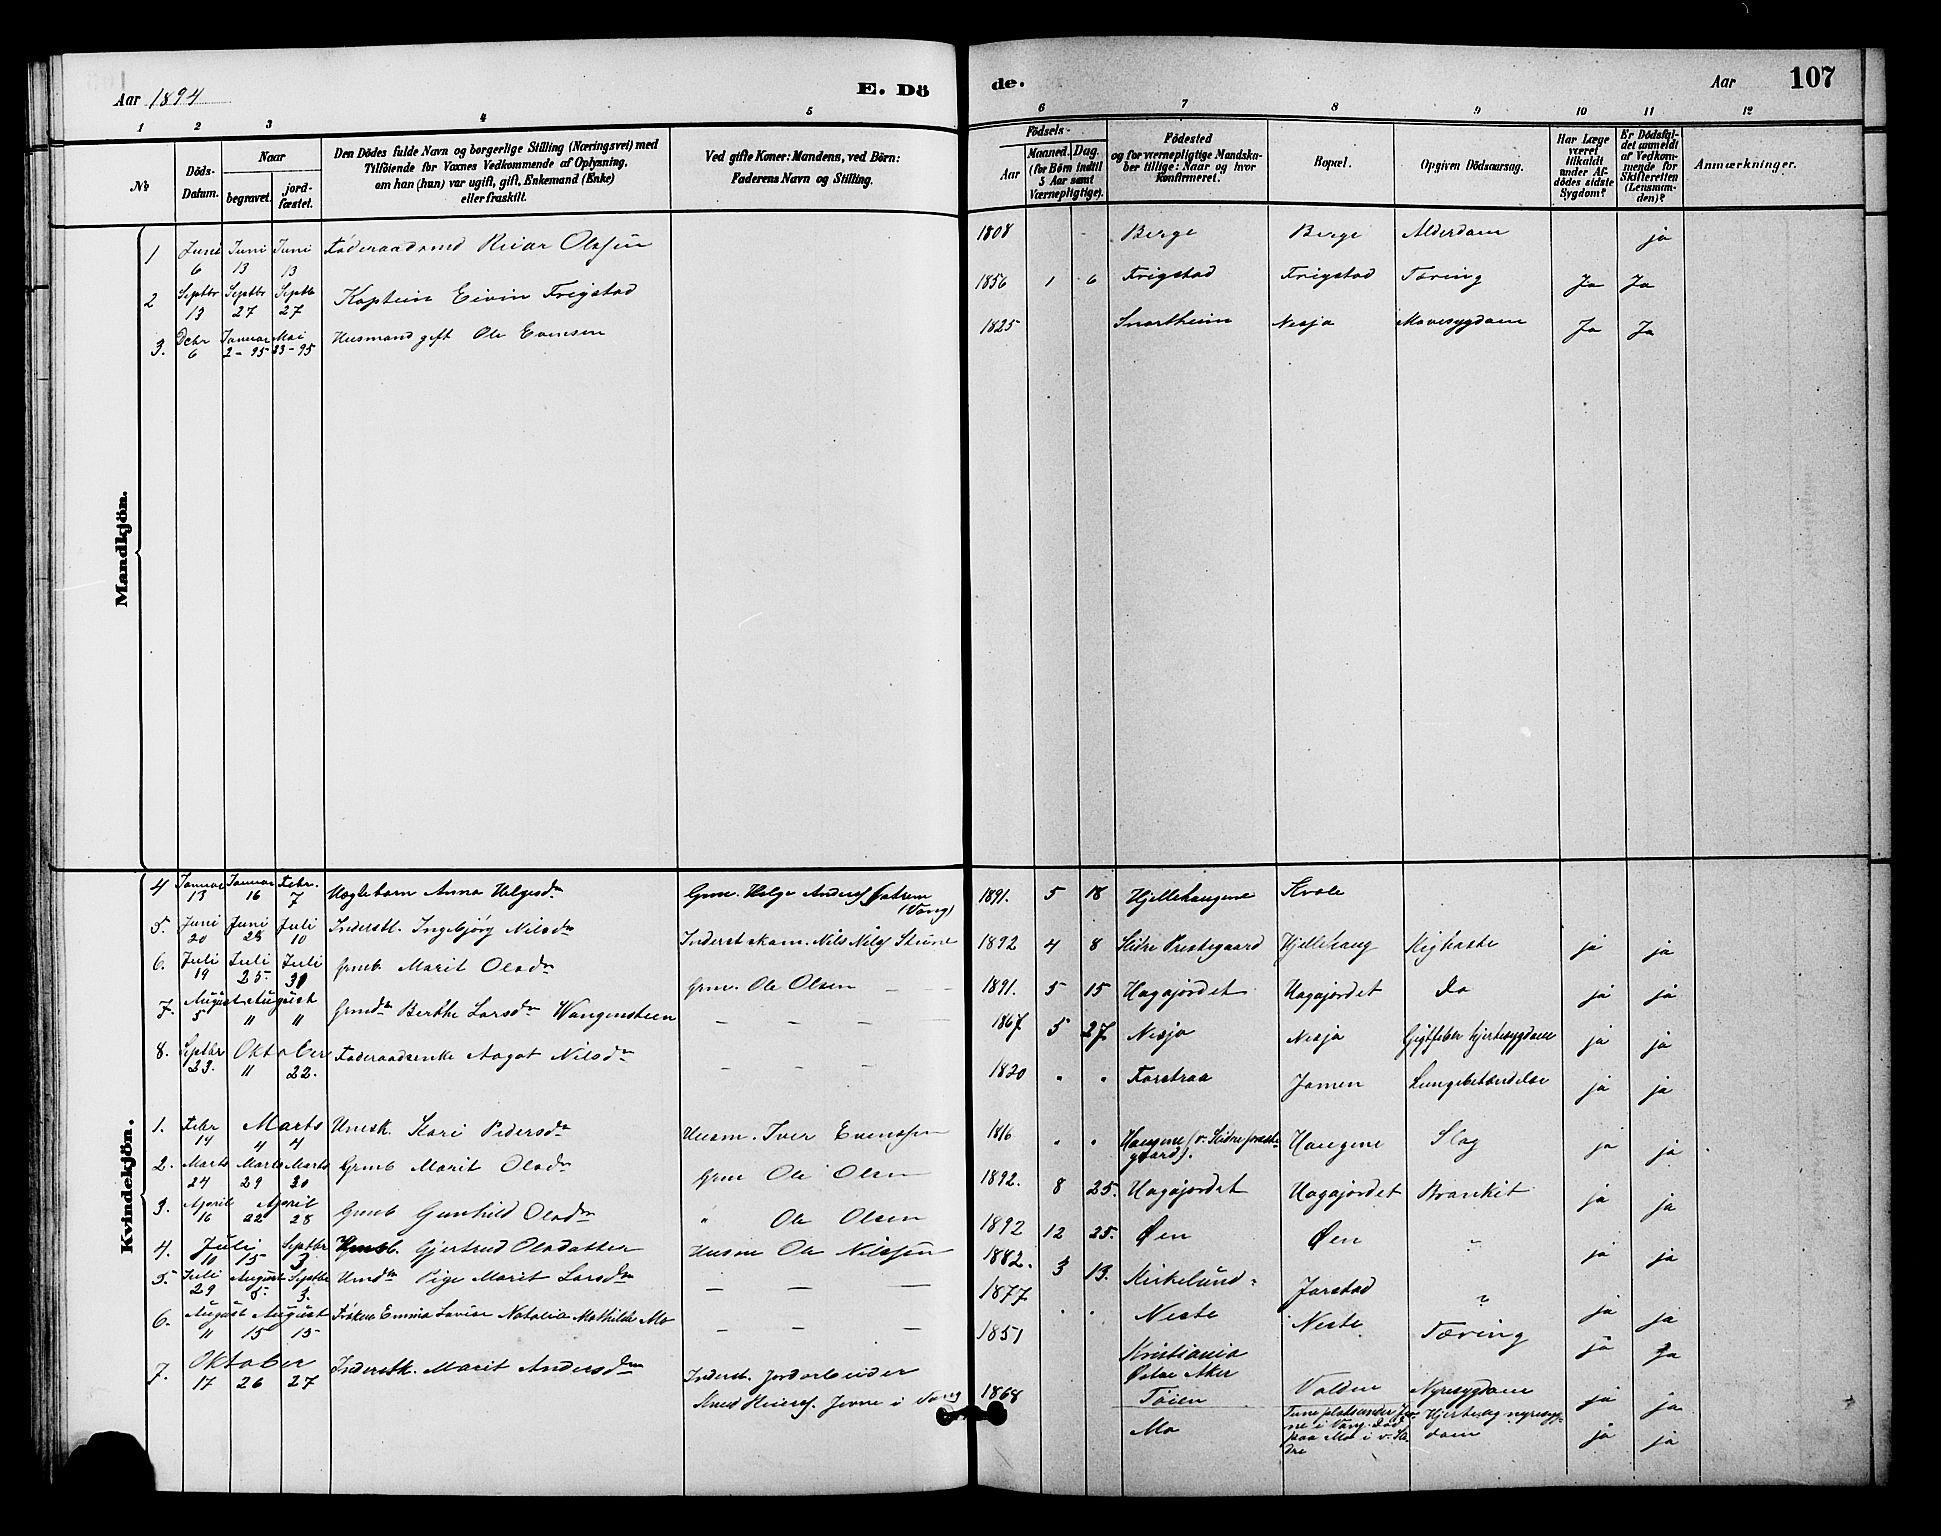 SAH, Vestre Slidre prestekontor, Klokkerbok nr. 4, 1881-1912, s. 107